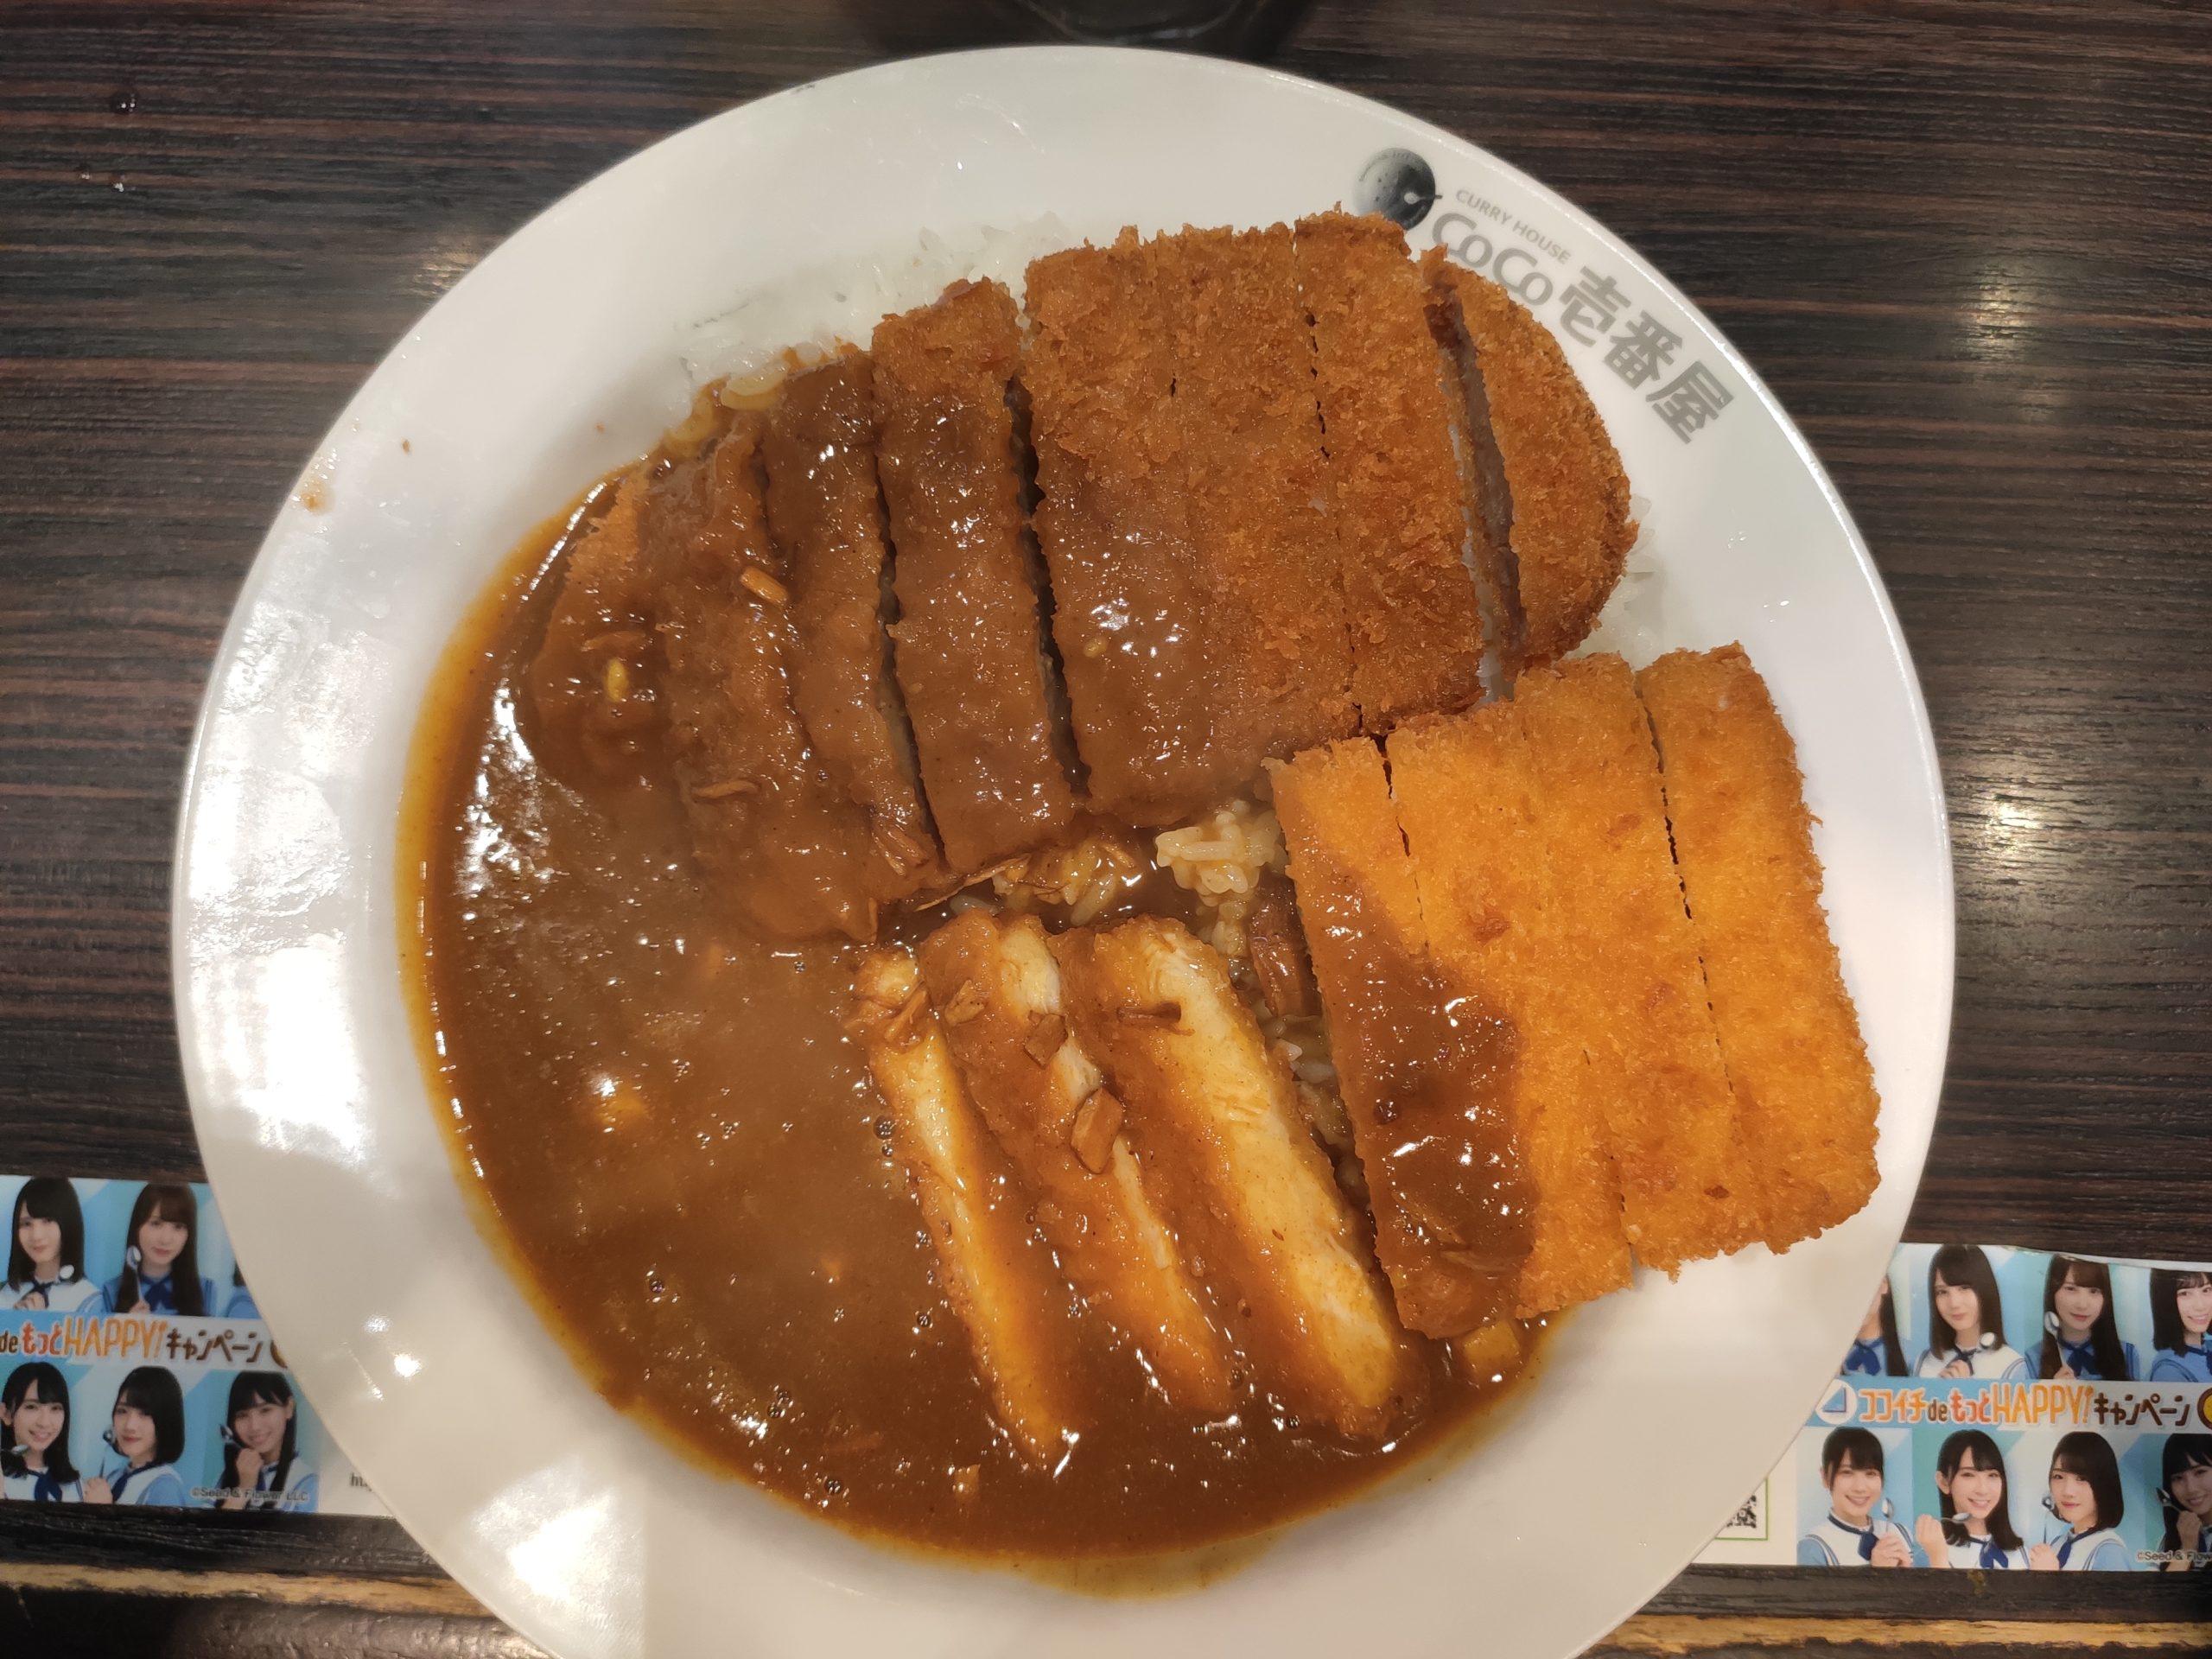 [Review] CoCo Ichibanya @ Tokyo, Japan